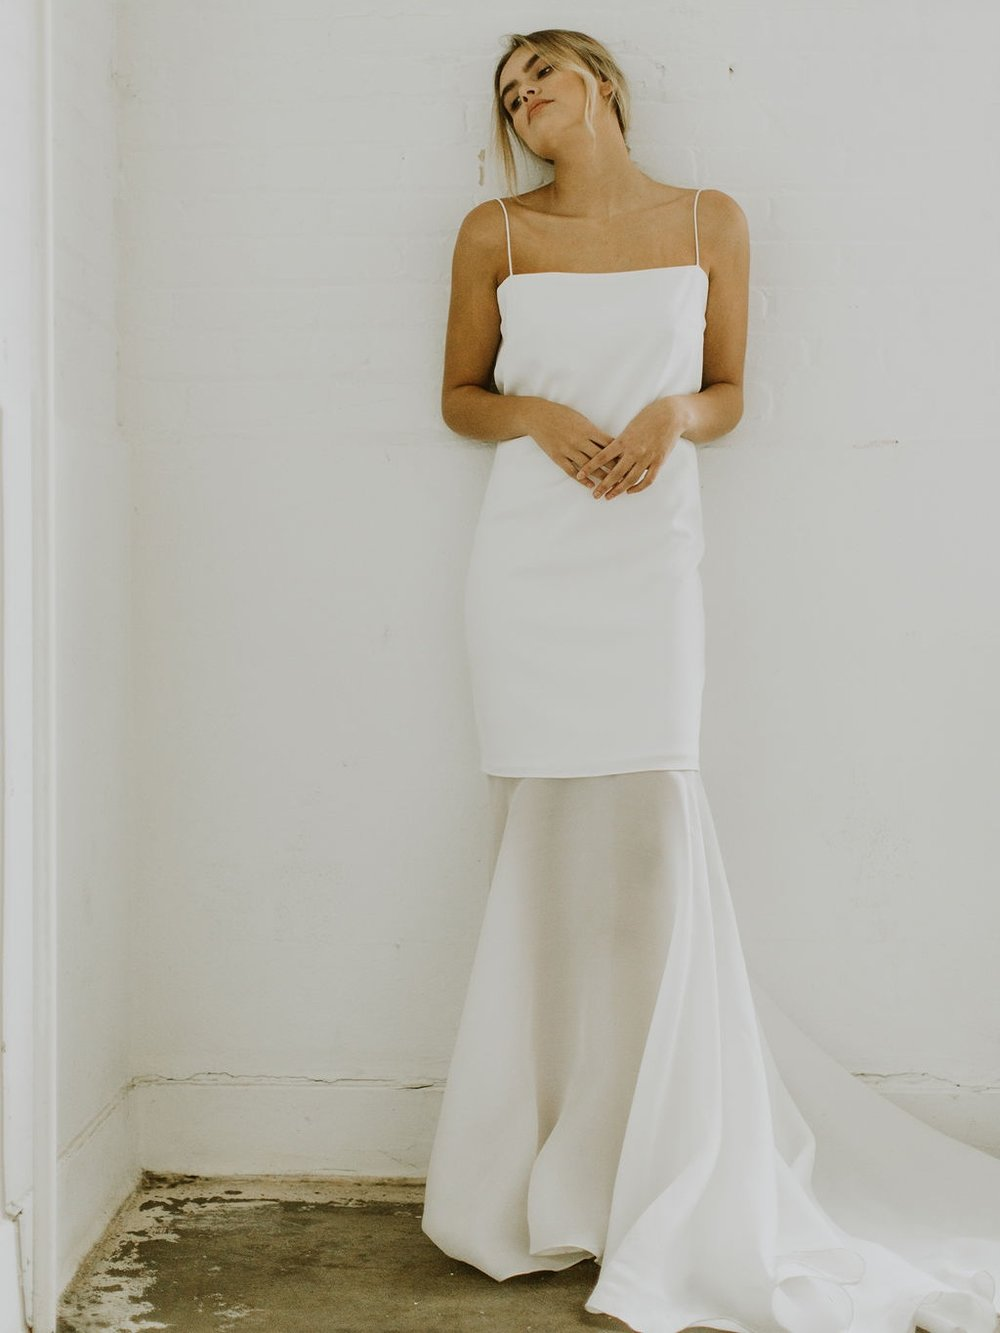 The LAW x Neue Bride Trunk Show for brides in Mesa, Arizona